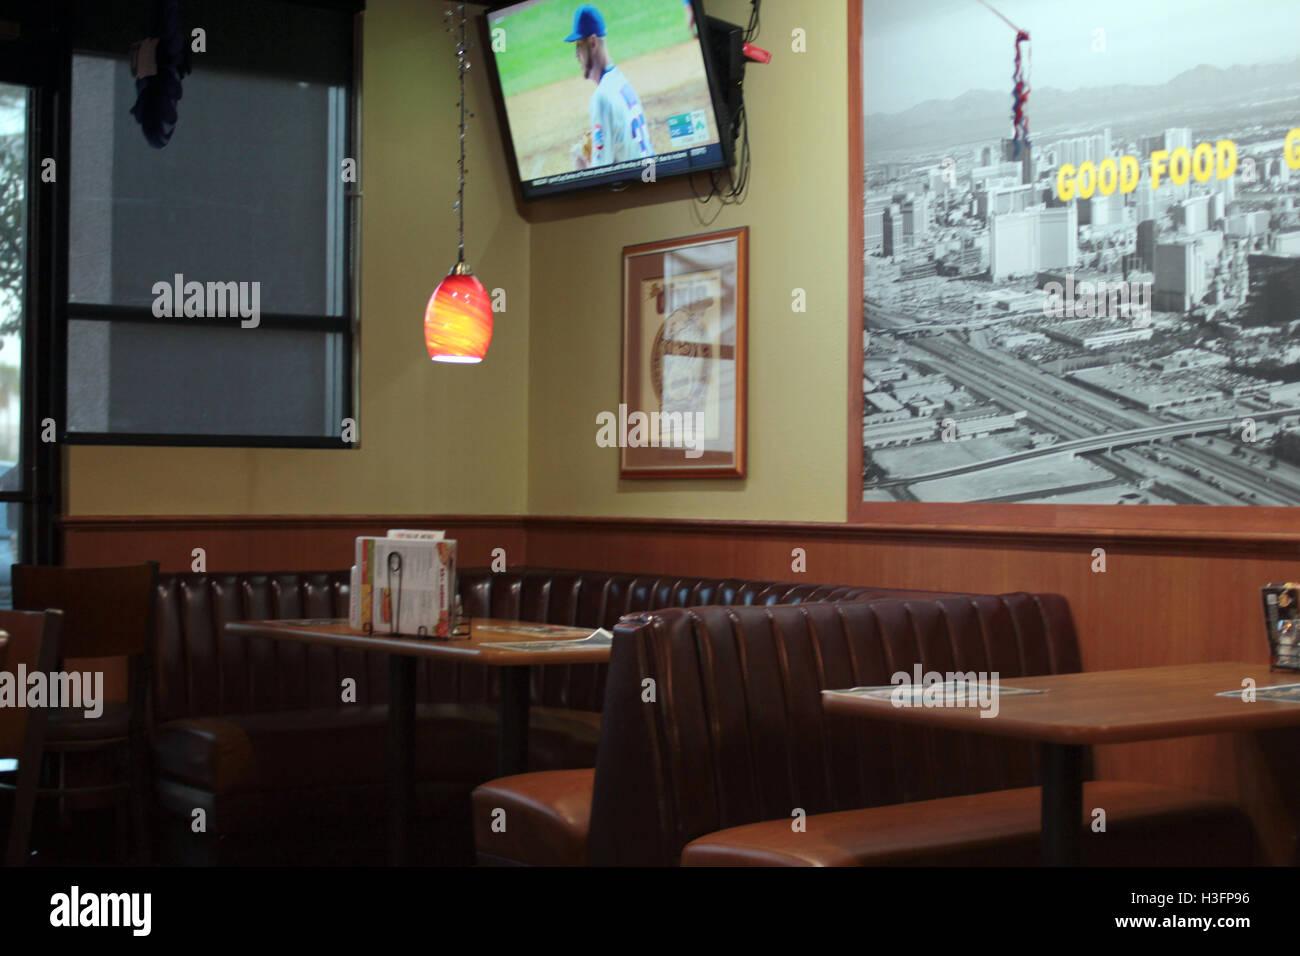 American diner in Las Vegas - Stock Image